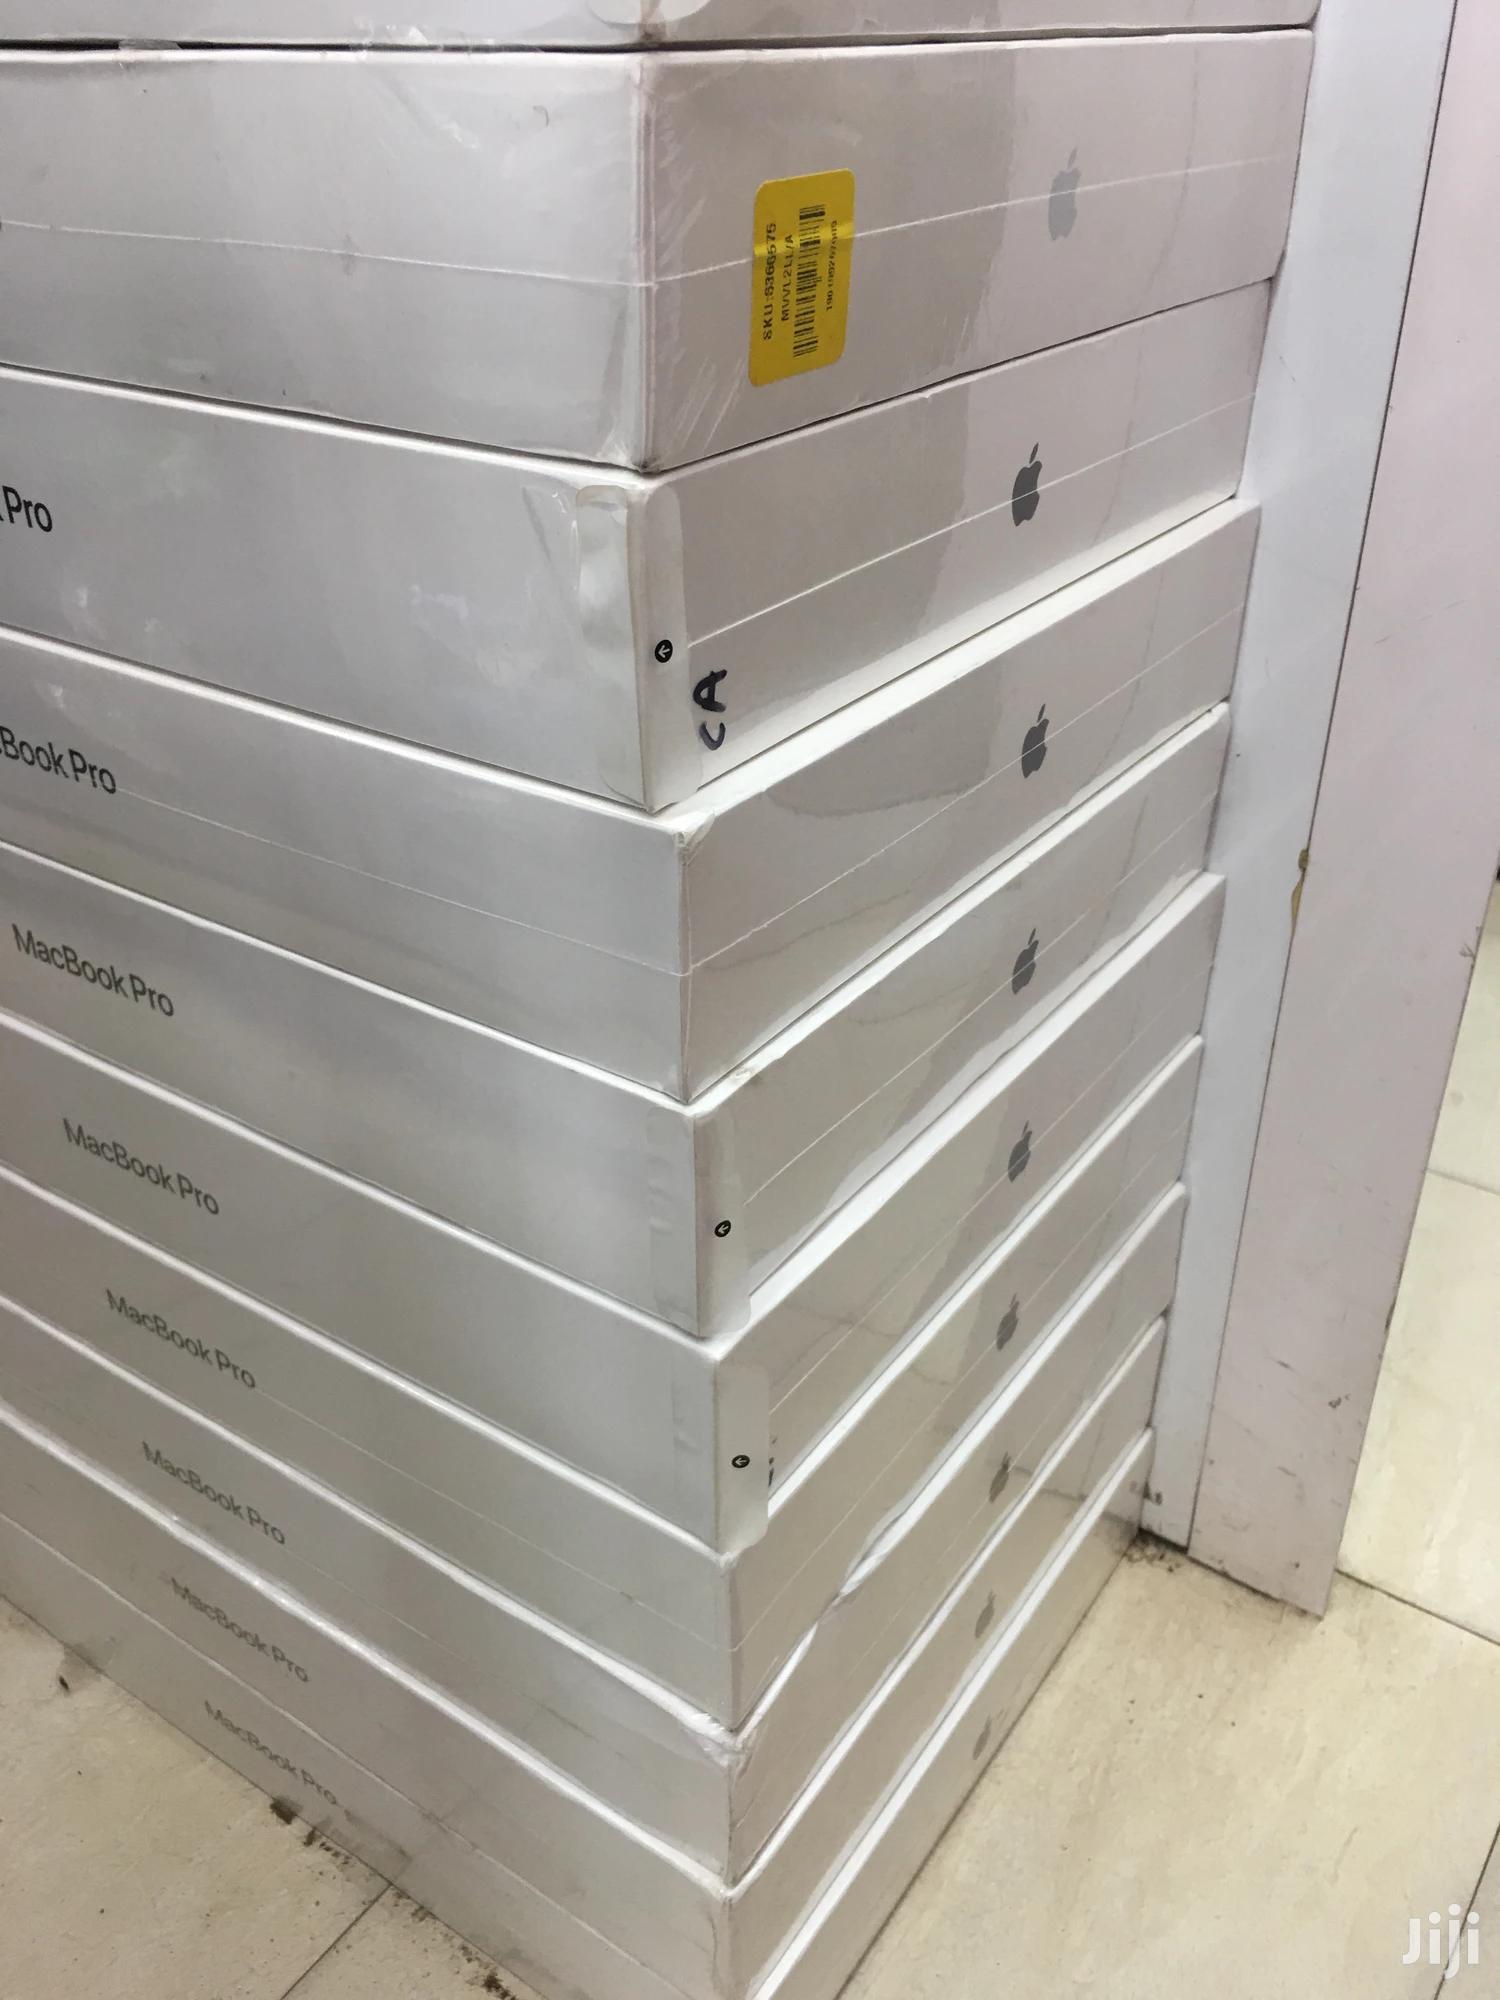 New Laptop Apple MacBook Pro 16GB Intel Core i9 1T   Laptops & Computers for sale in Accra Metropolitan, Greater Accra, Ghana